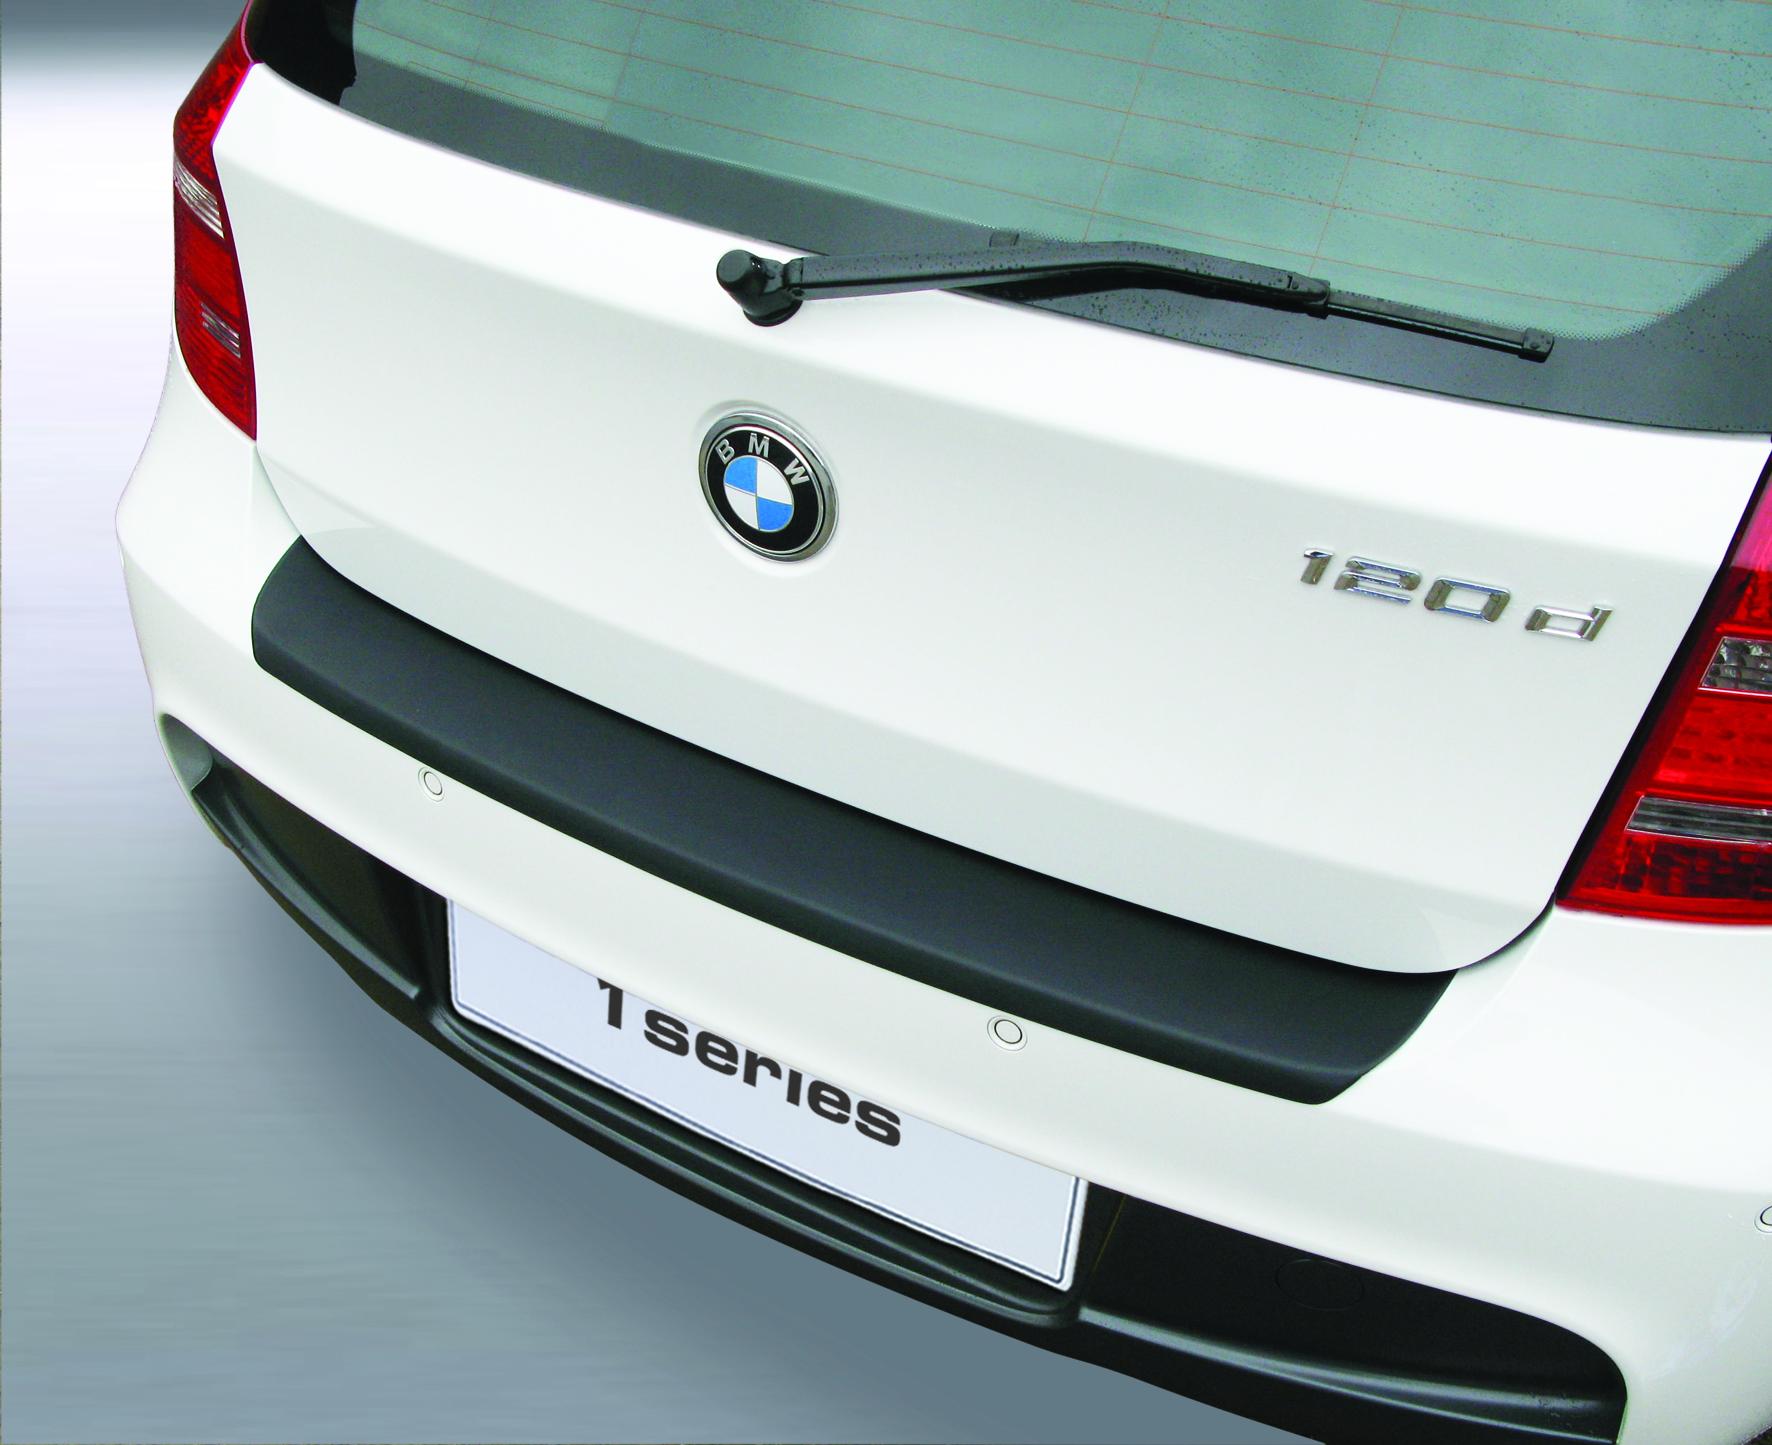 Накладка на задний бампер BMW 1 серии M Sport, 5-дв. хэтчбек, кузов E87, 2004-2011